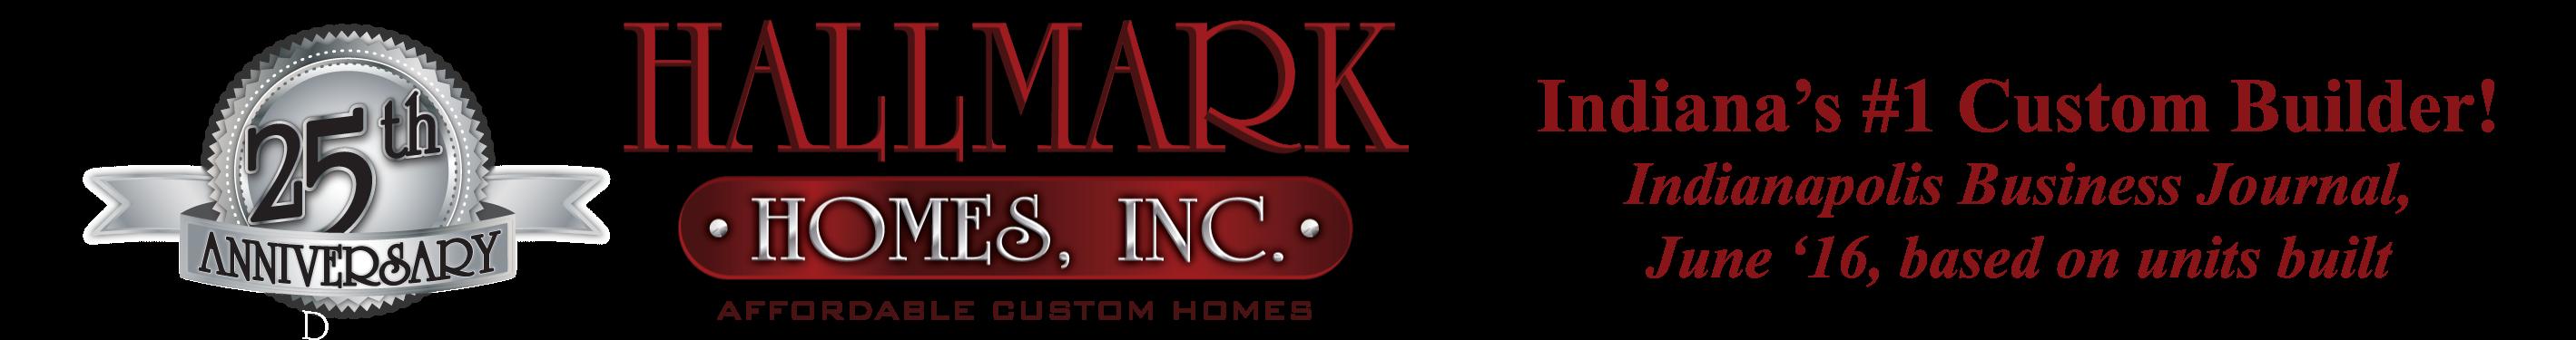 "Hallmark Homes - Indiana's Leading ""On Your Lot"" Custom Builder!"